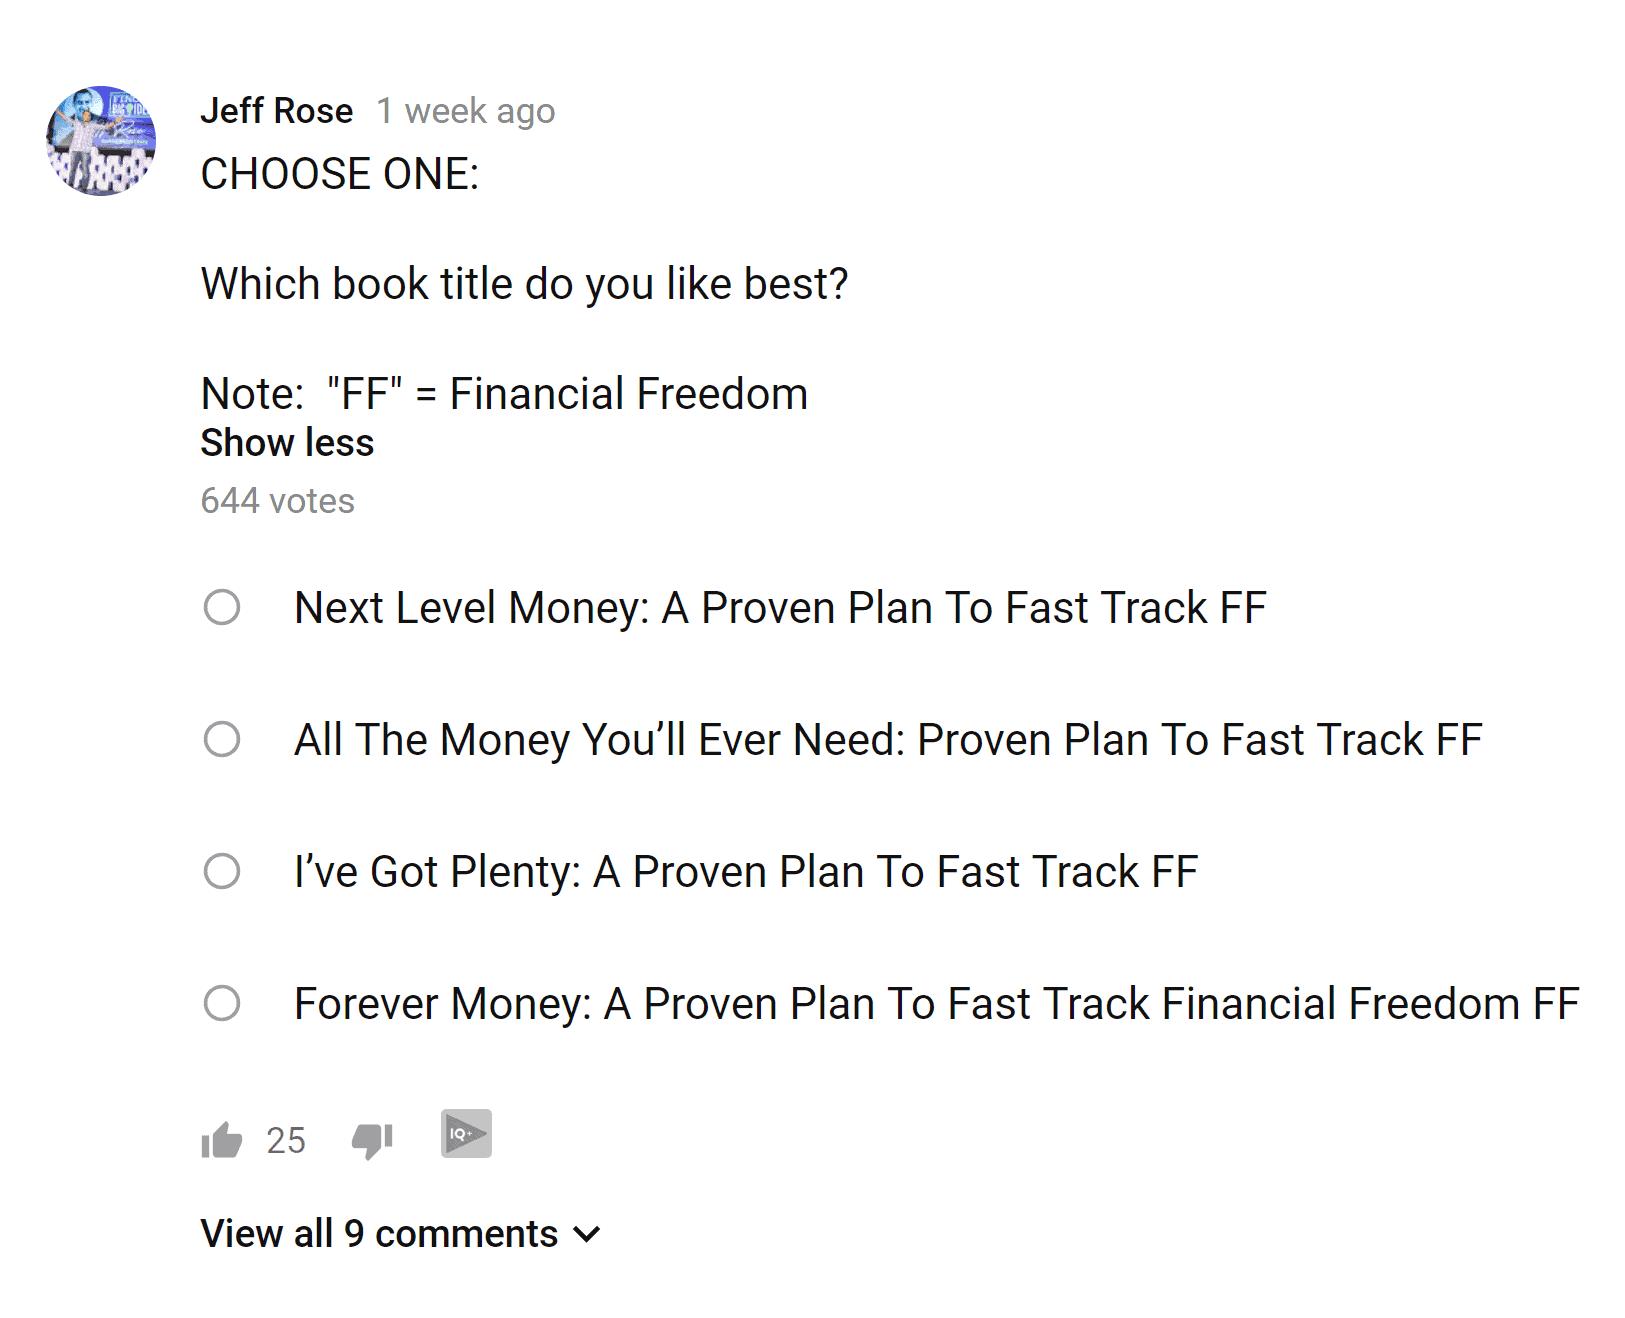 Jeff Rose poll